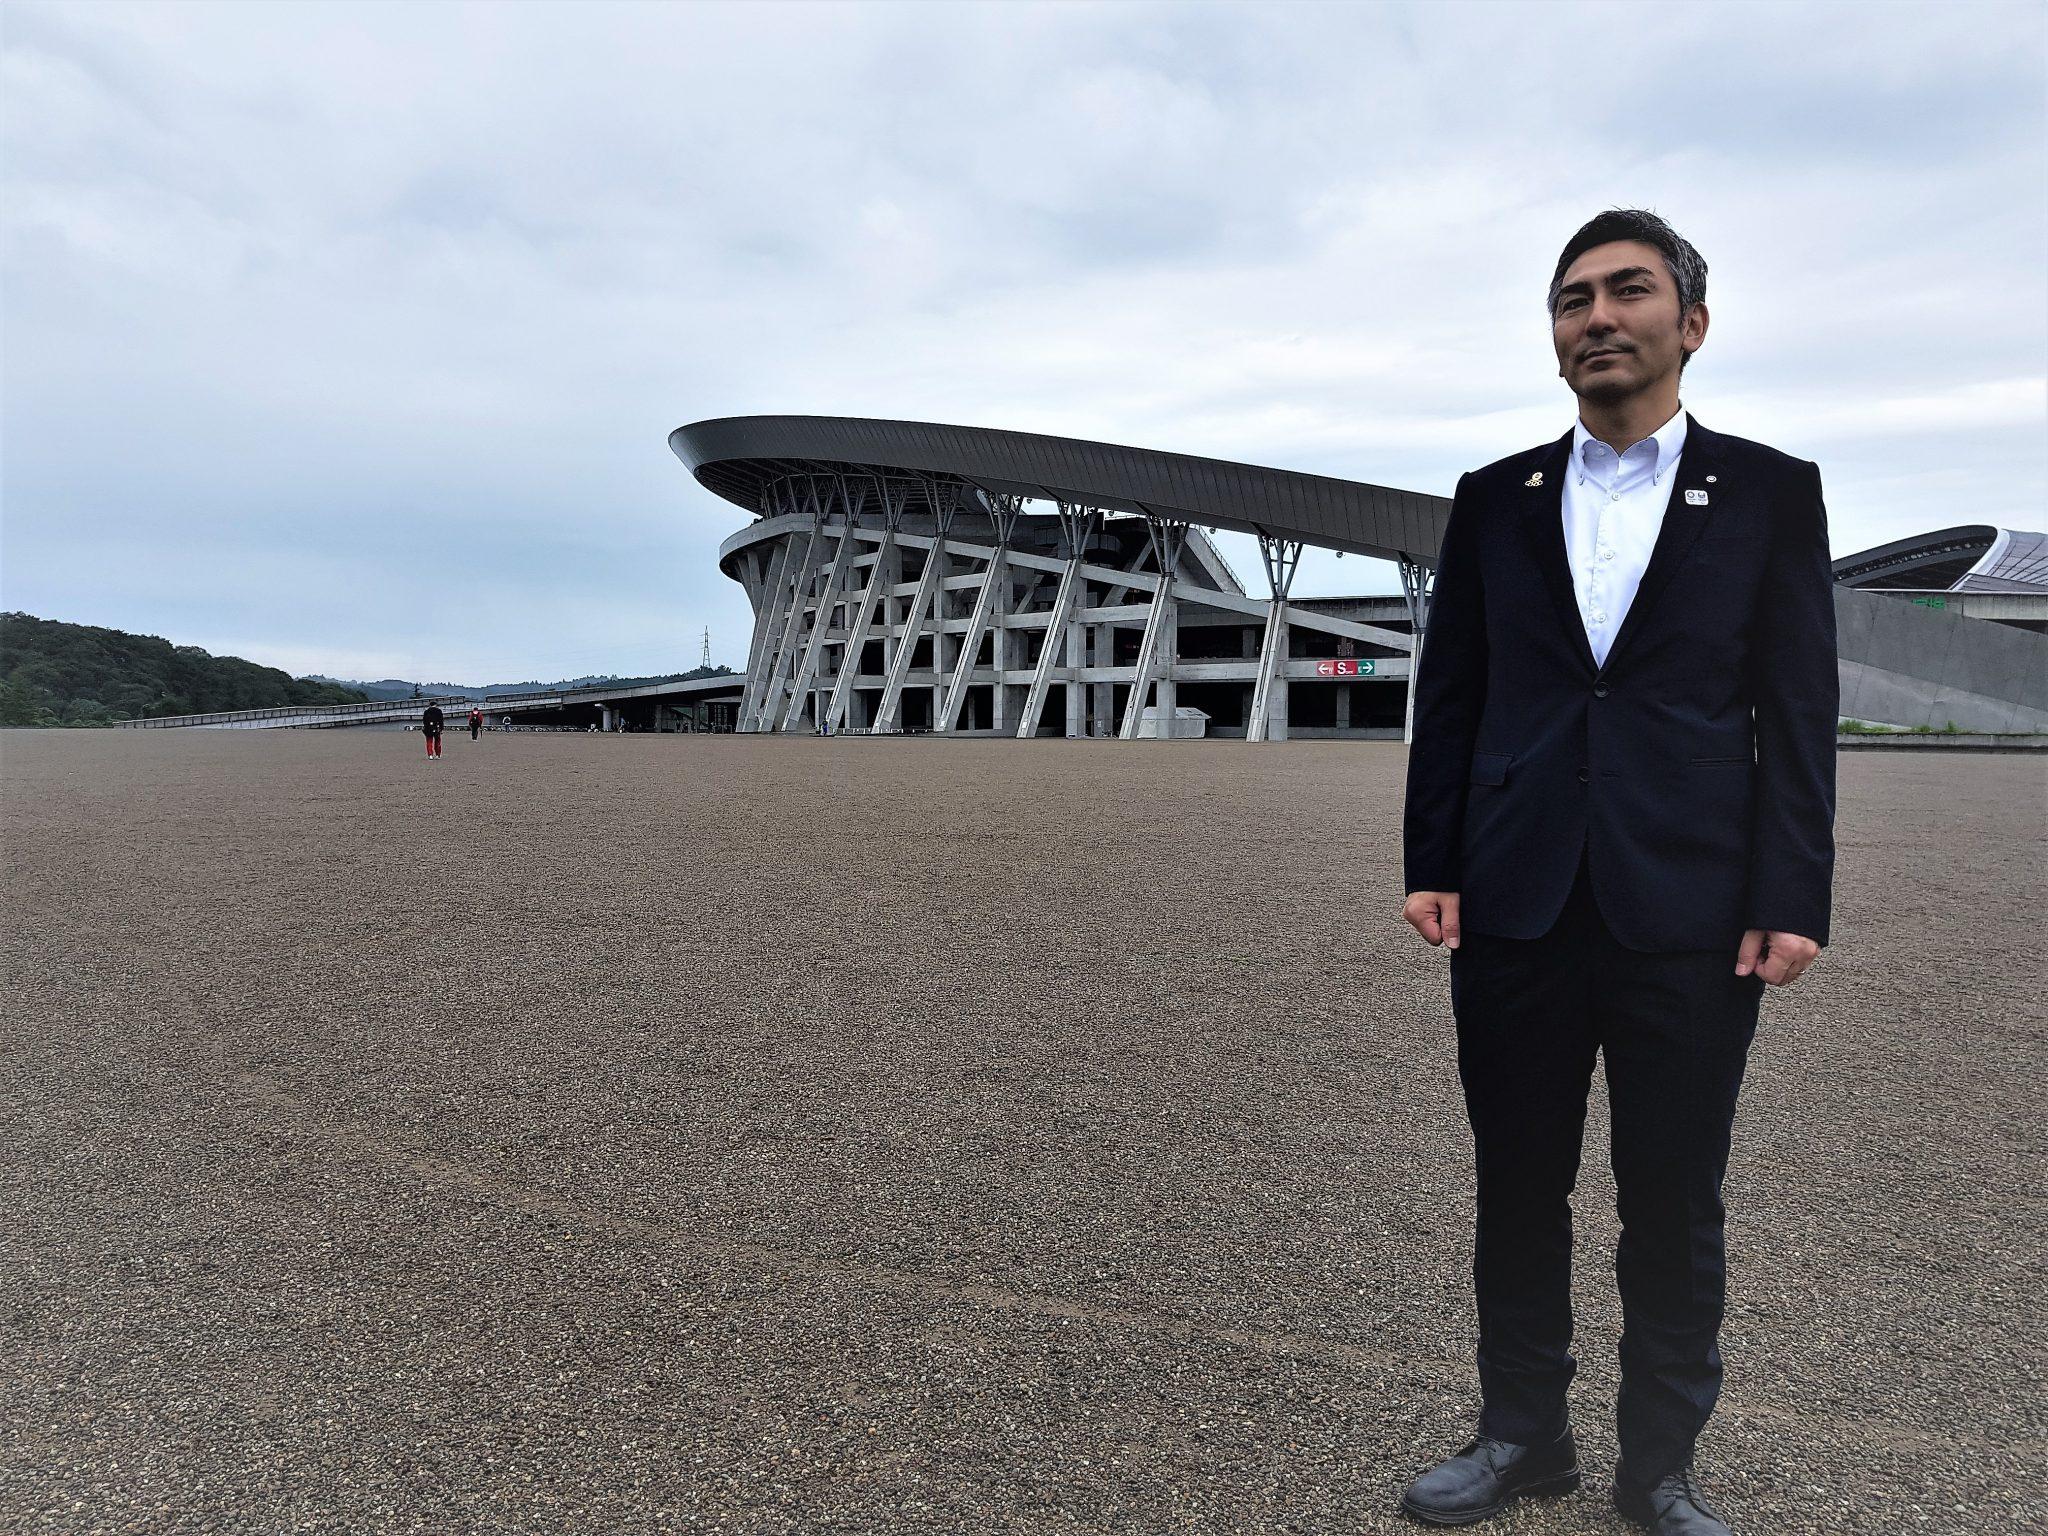 The Mayor of rufu town, Yutuka Kumagai